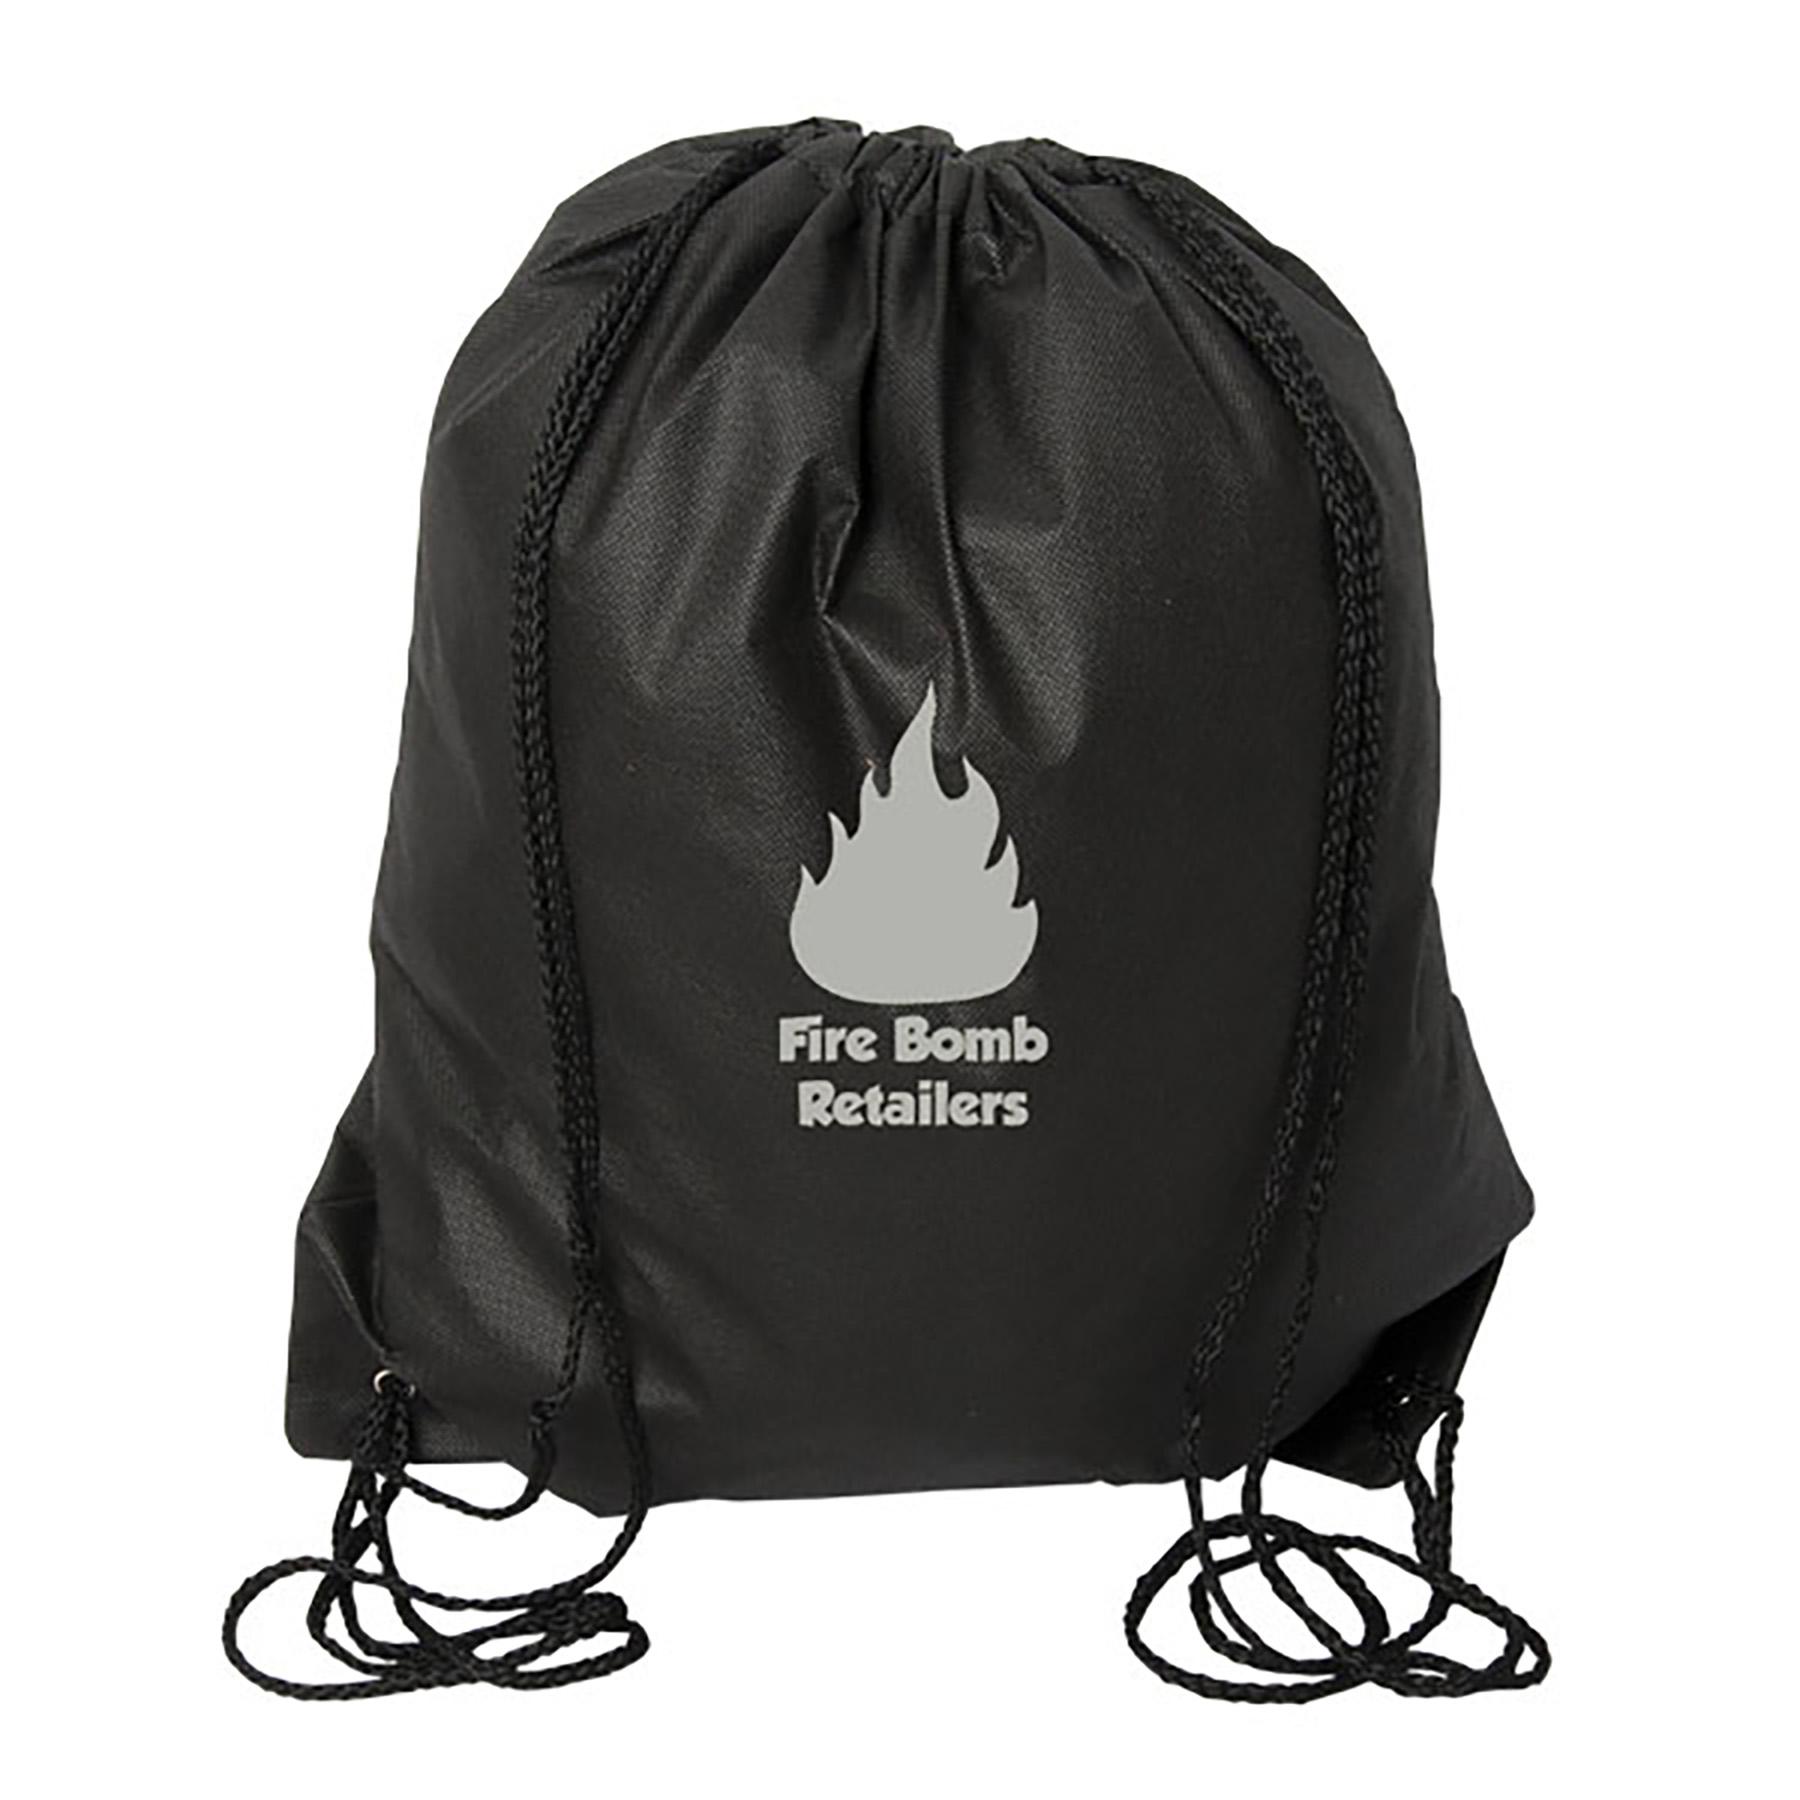 Urban Adventurer Non Woven Drawstring Backpack, NW9190, 1 Colour Imprint